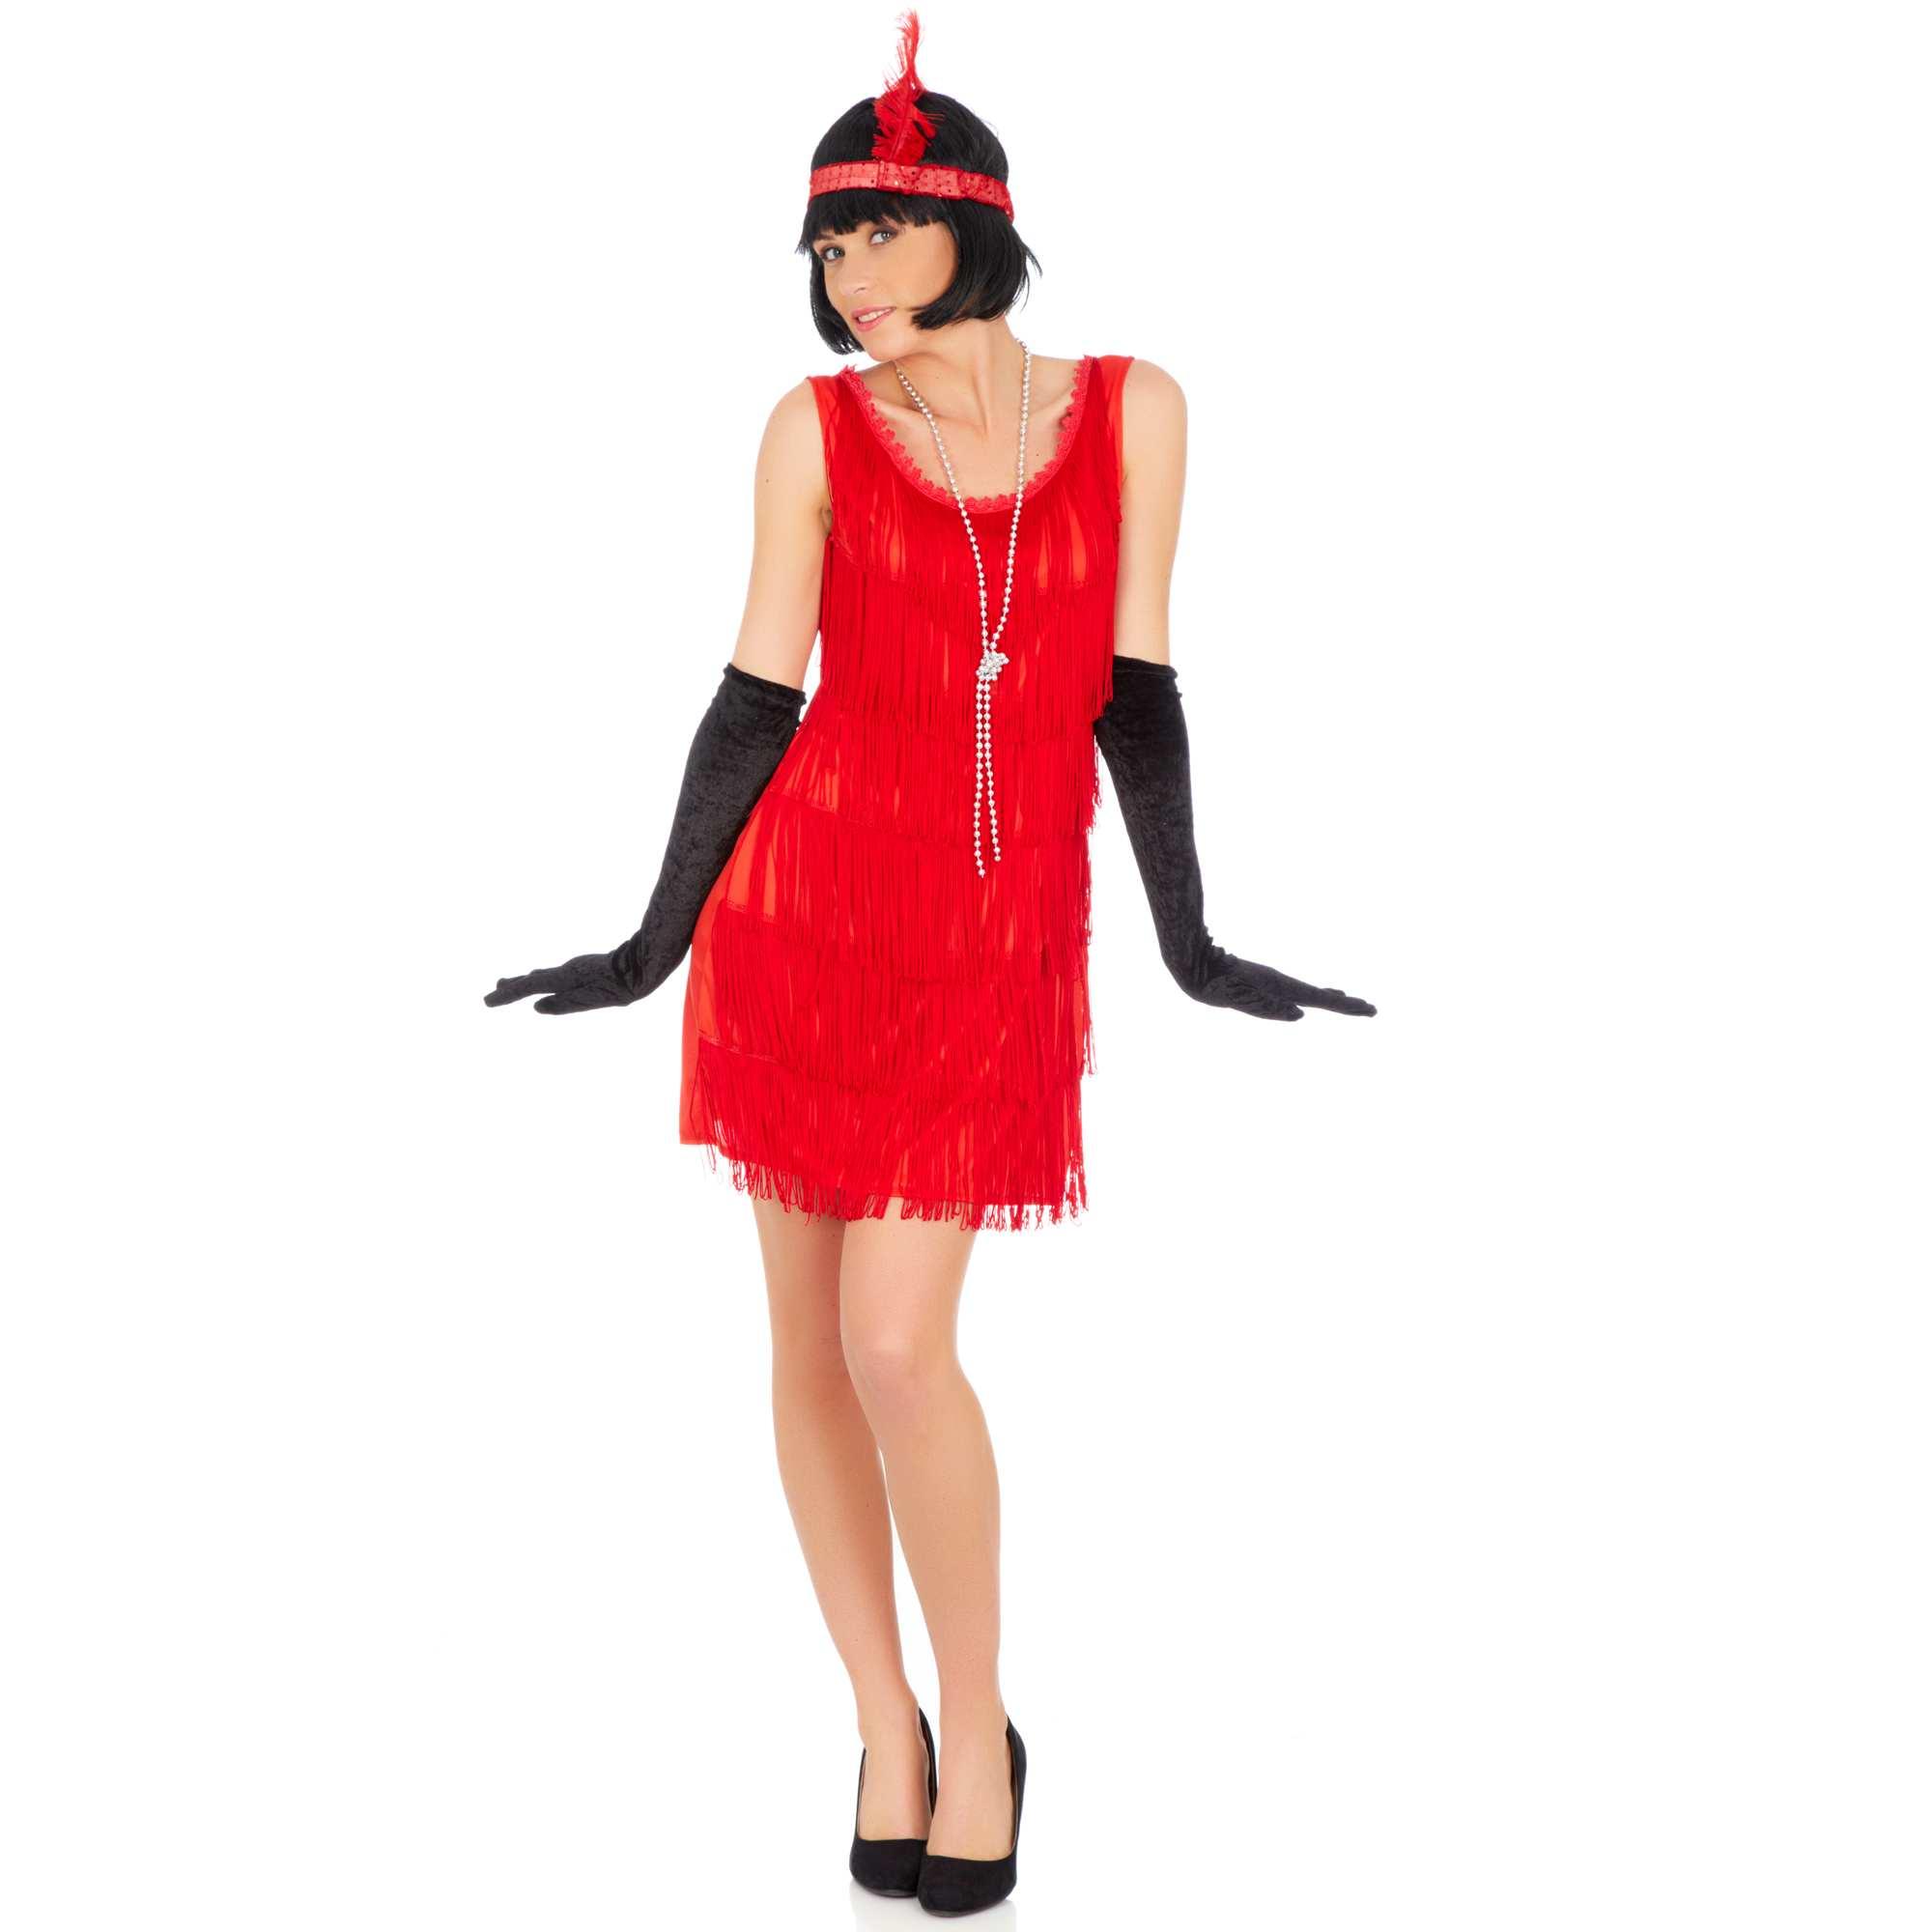 costume charleston femme rouge kiabi 18 00. Black Bedroom Furniture Sets. Home Design Ideas